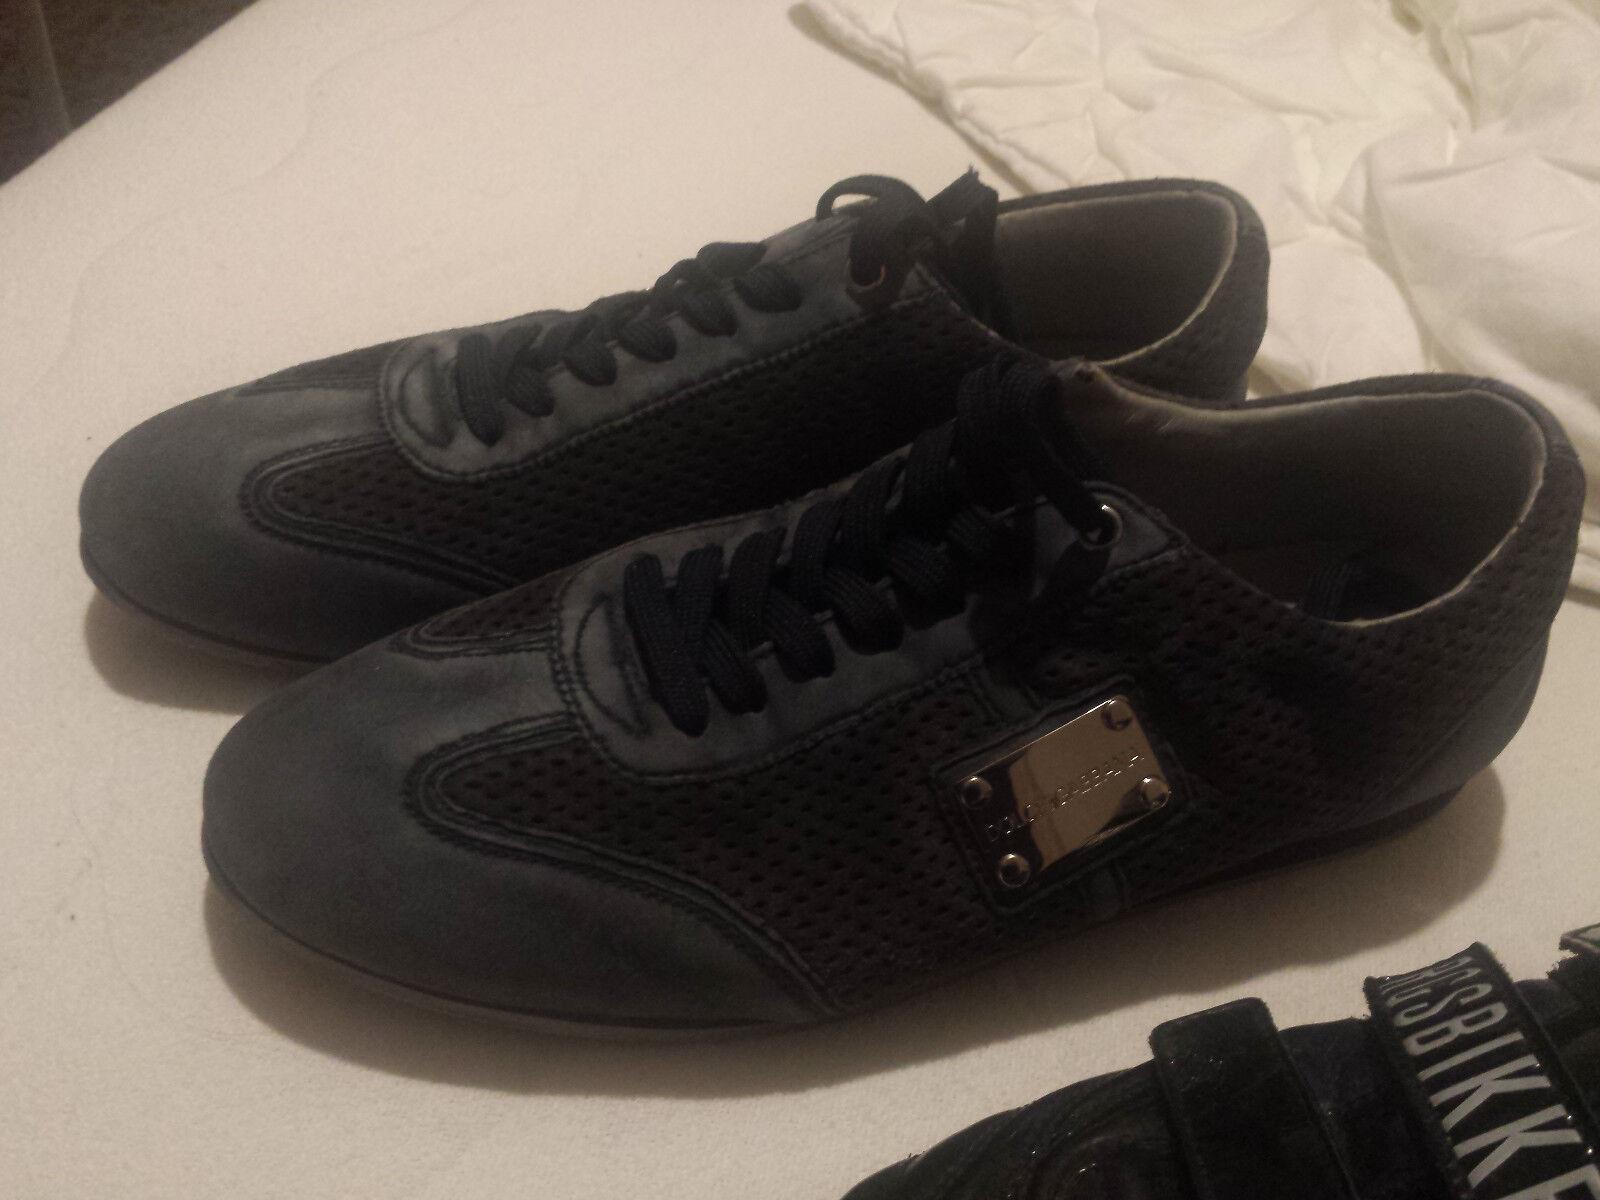 Dolce Gabbana Schuhe Größe Größe Schuhe 43/44 NP 92fe5a